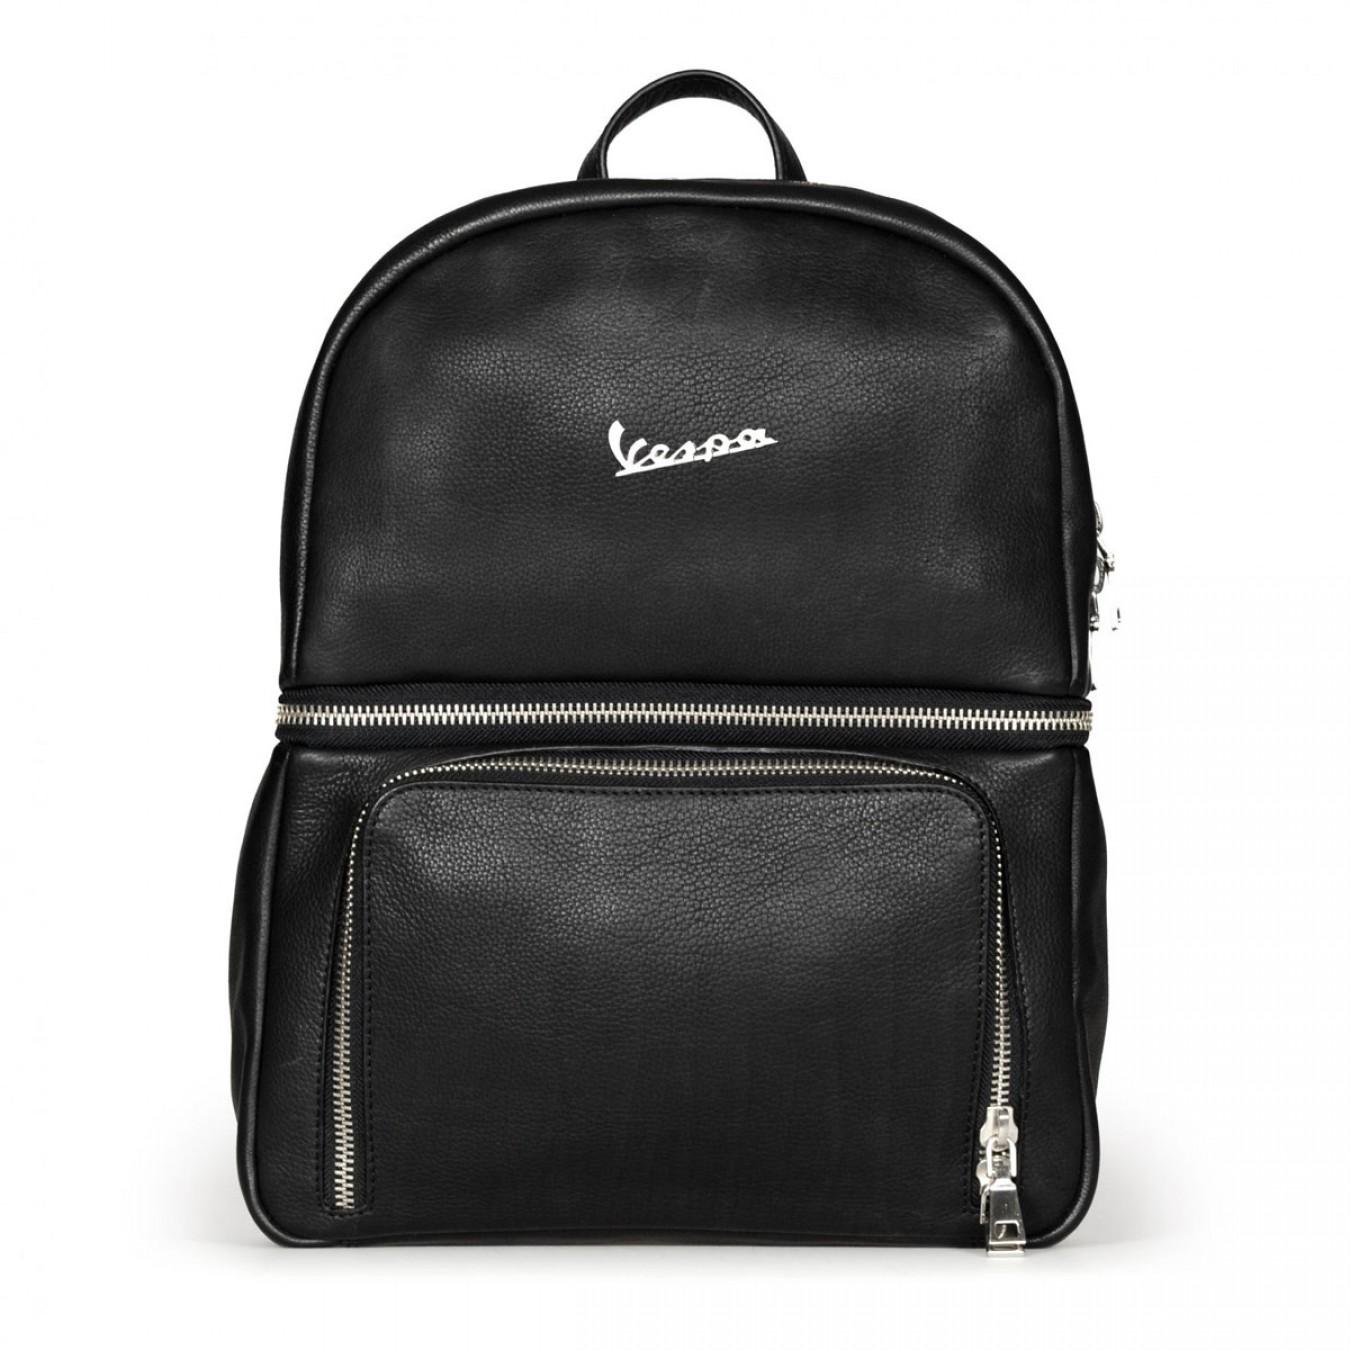 2794761da0 Vespa Σακίδιο Πλάτης Primavera Backpack- Genuine Full Grain Leather - Black  Τσάντες   Σακίδια